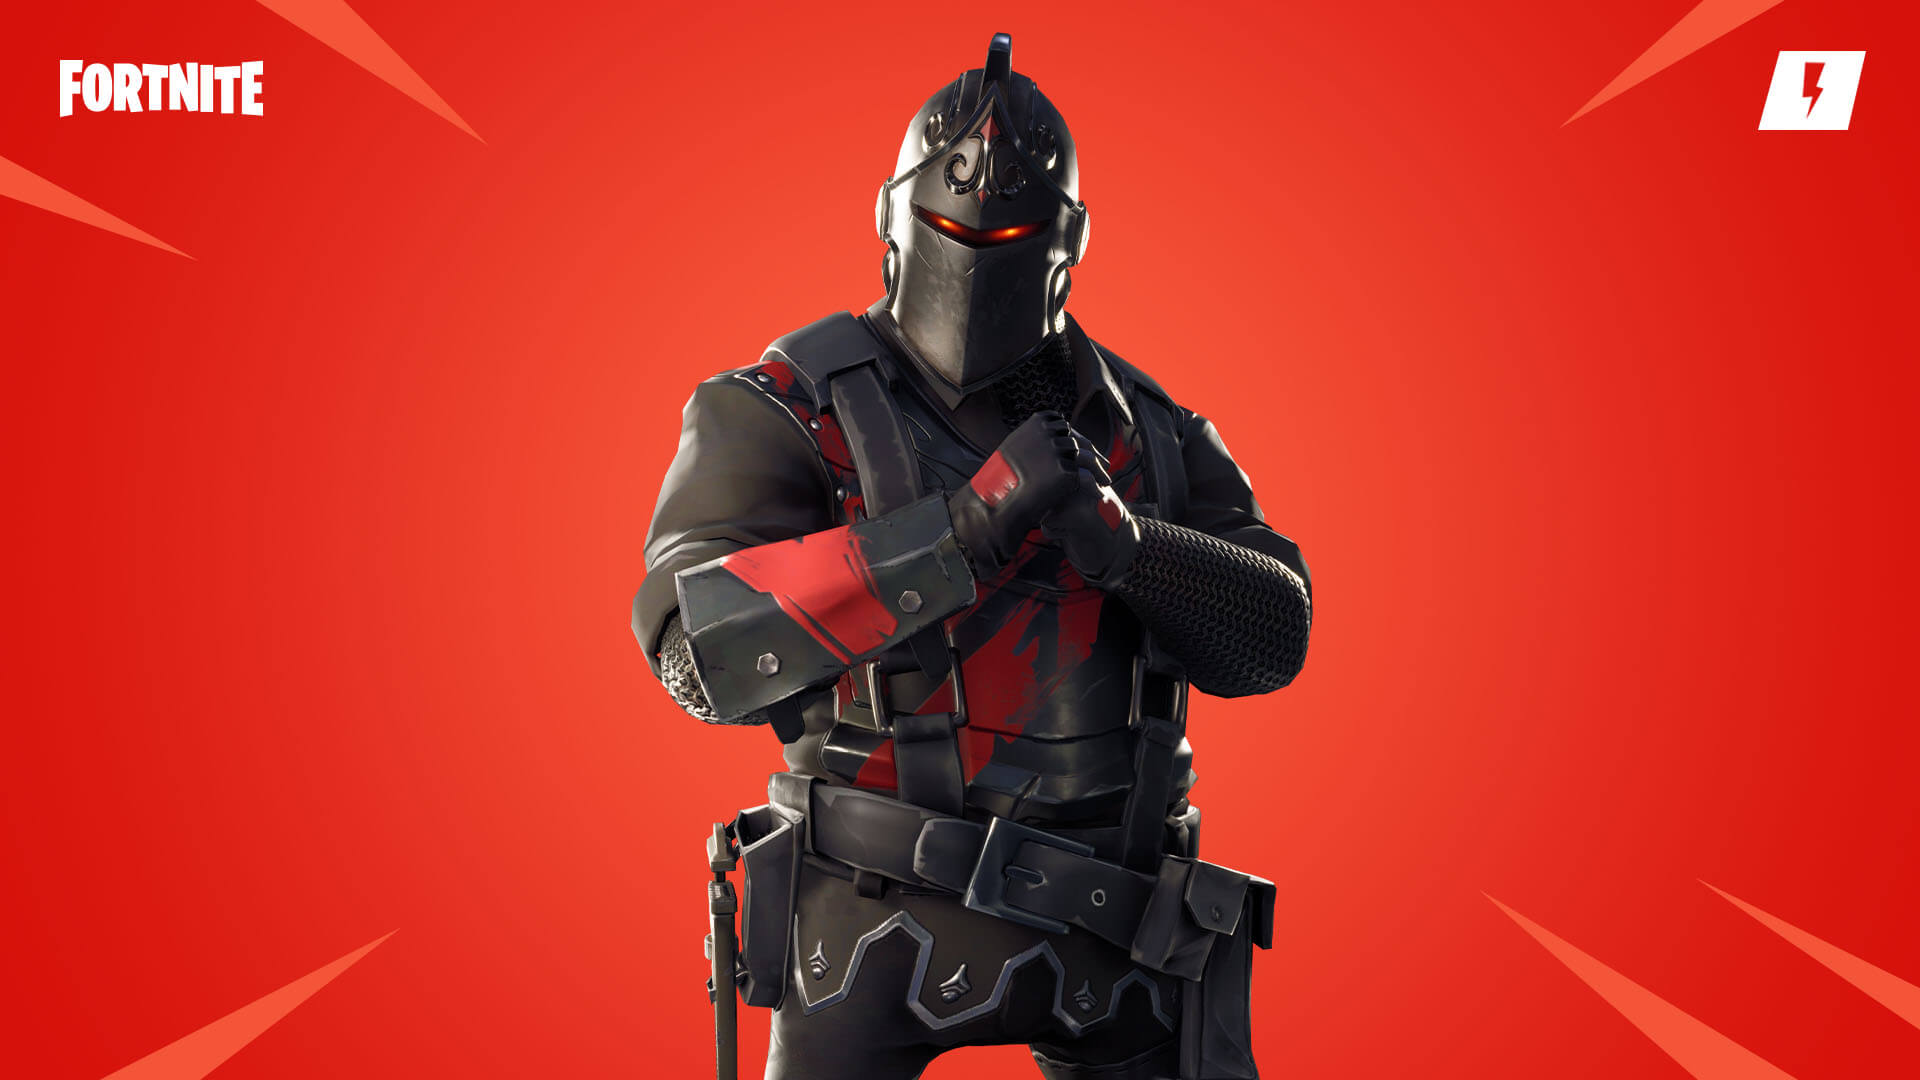 Fortnite Save The World Black Knight Garridan